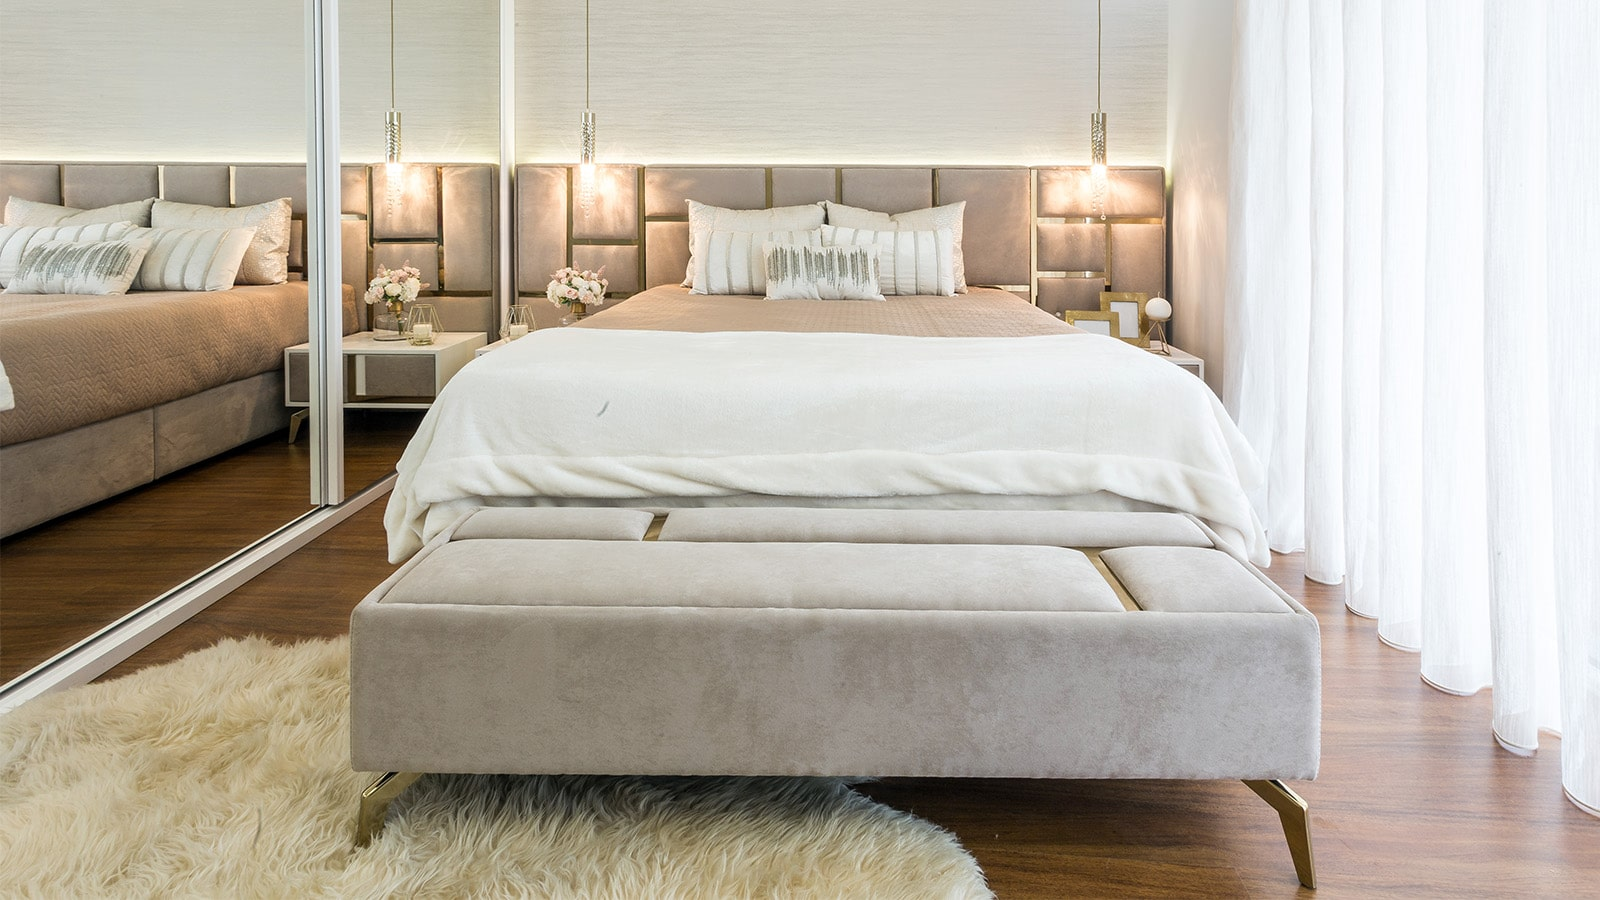 Quarto-Design-Decoracao-interiores